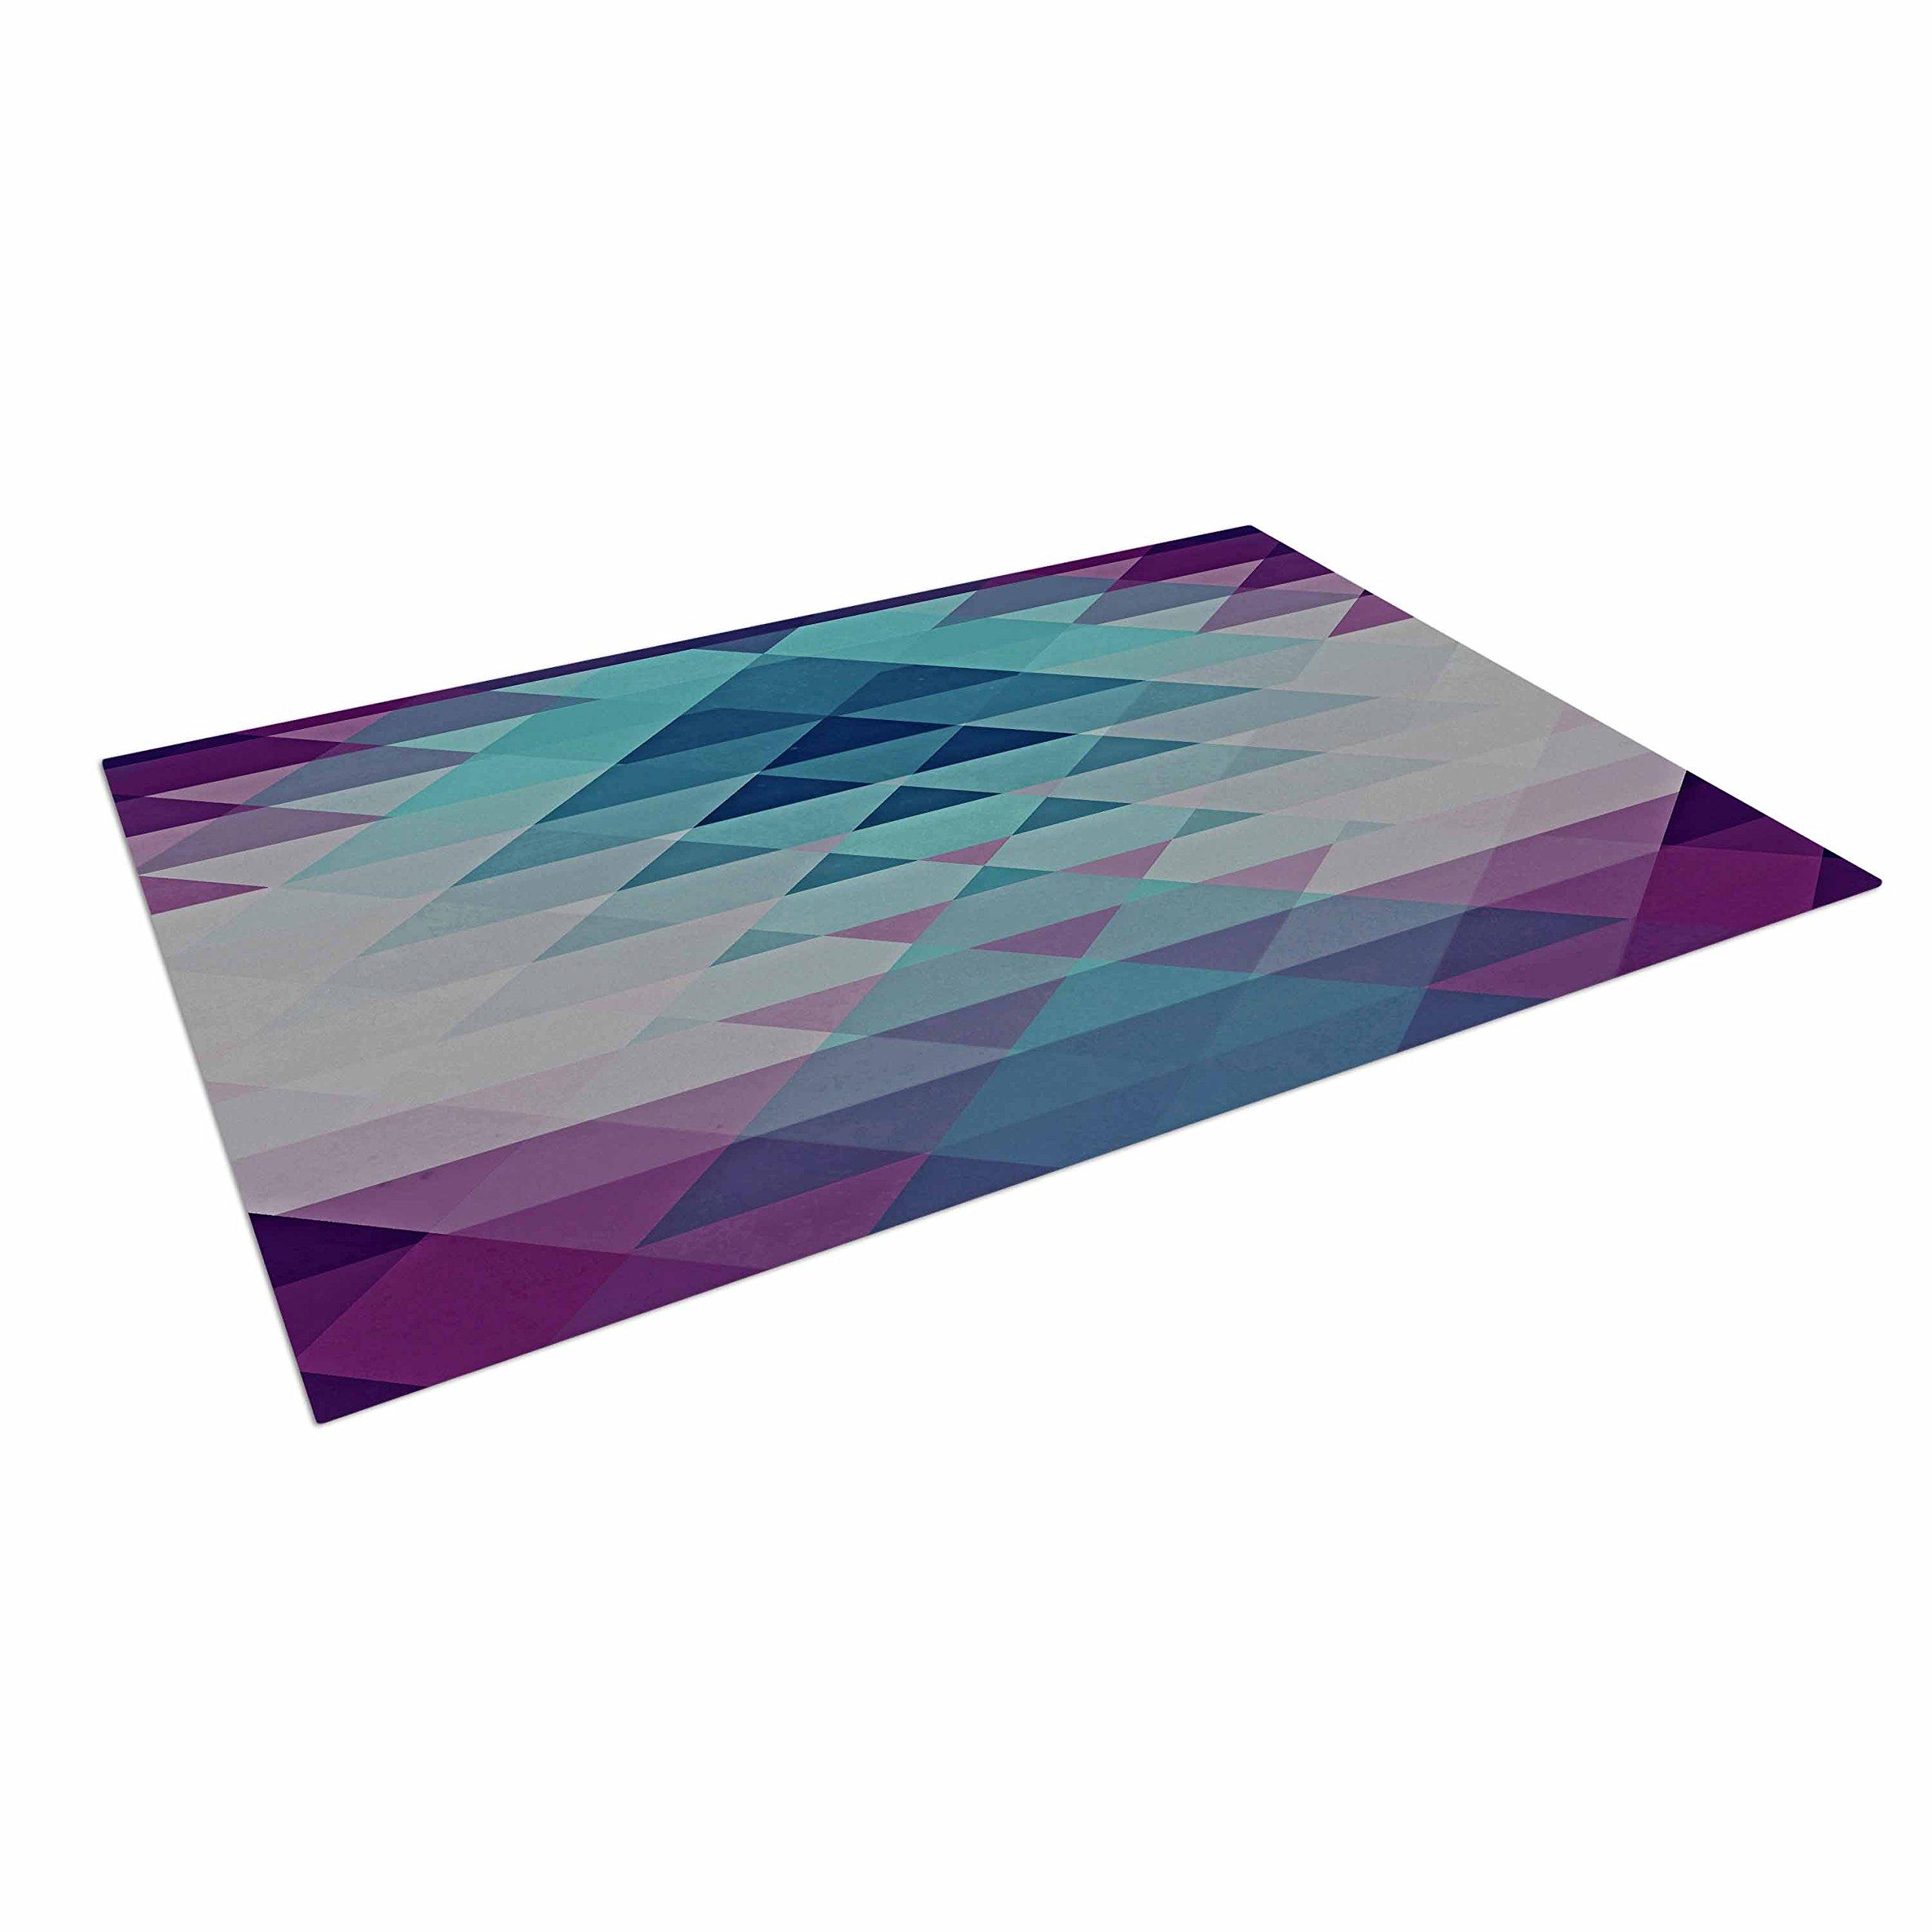 KESS InHouse Nika Martinez ''Hipster Girl'' Blue Lavender Outdoor Floor Mat, 4' x 5'